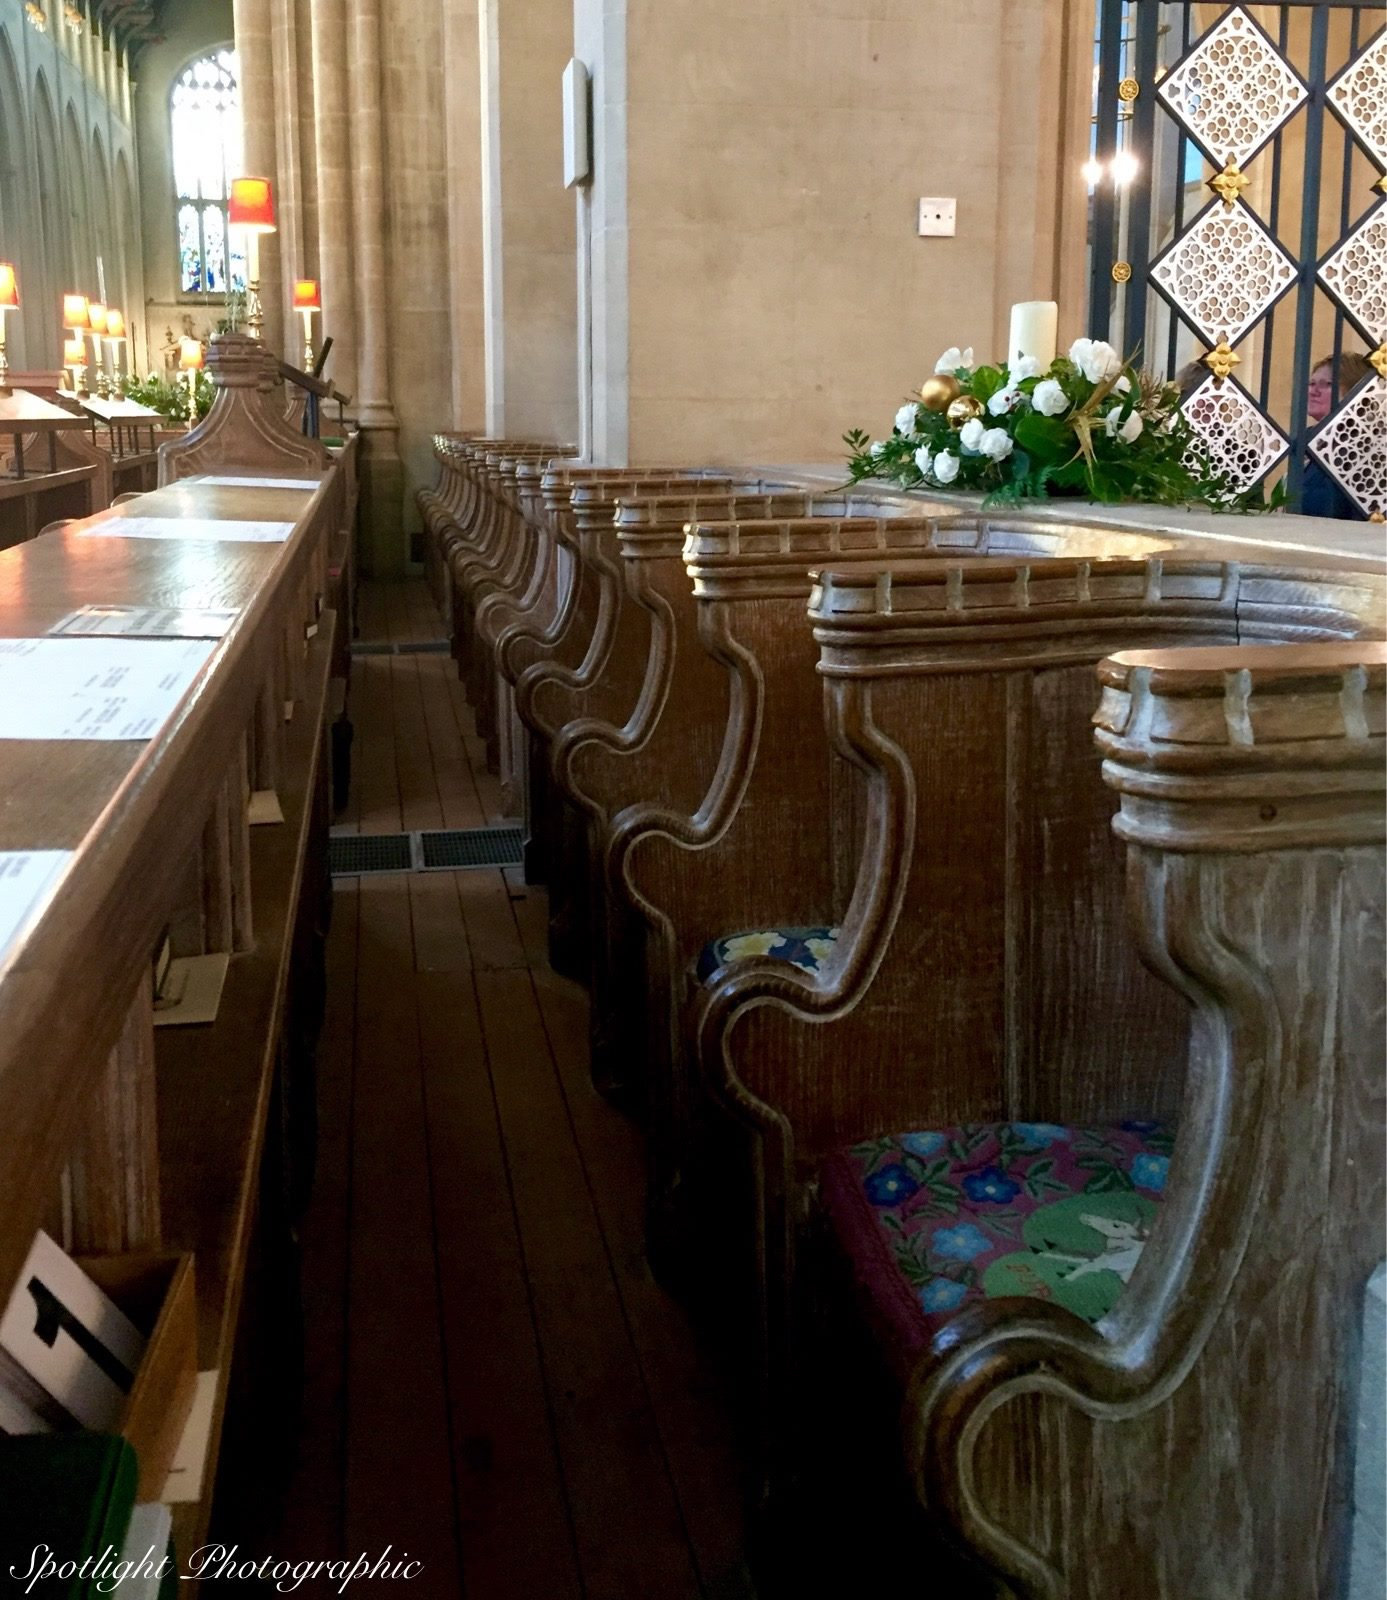 St Edmunds Cathedrl